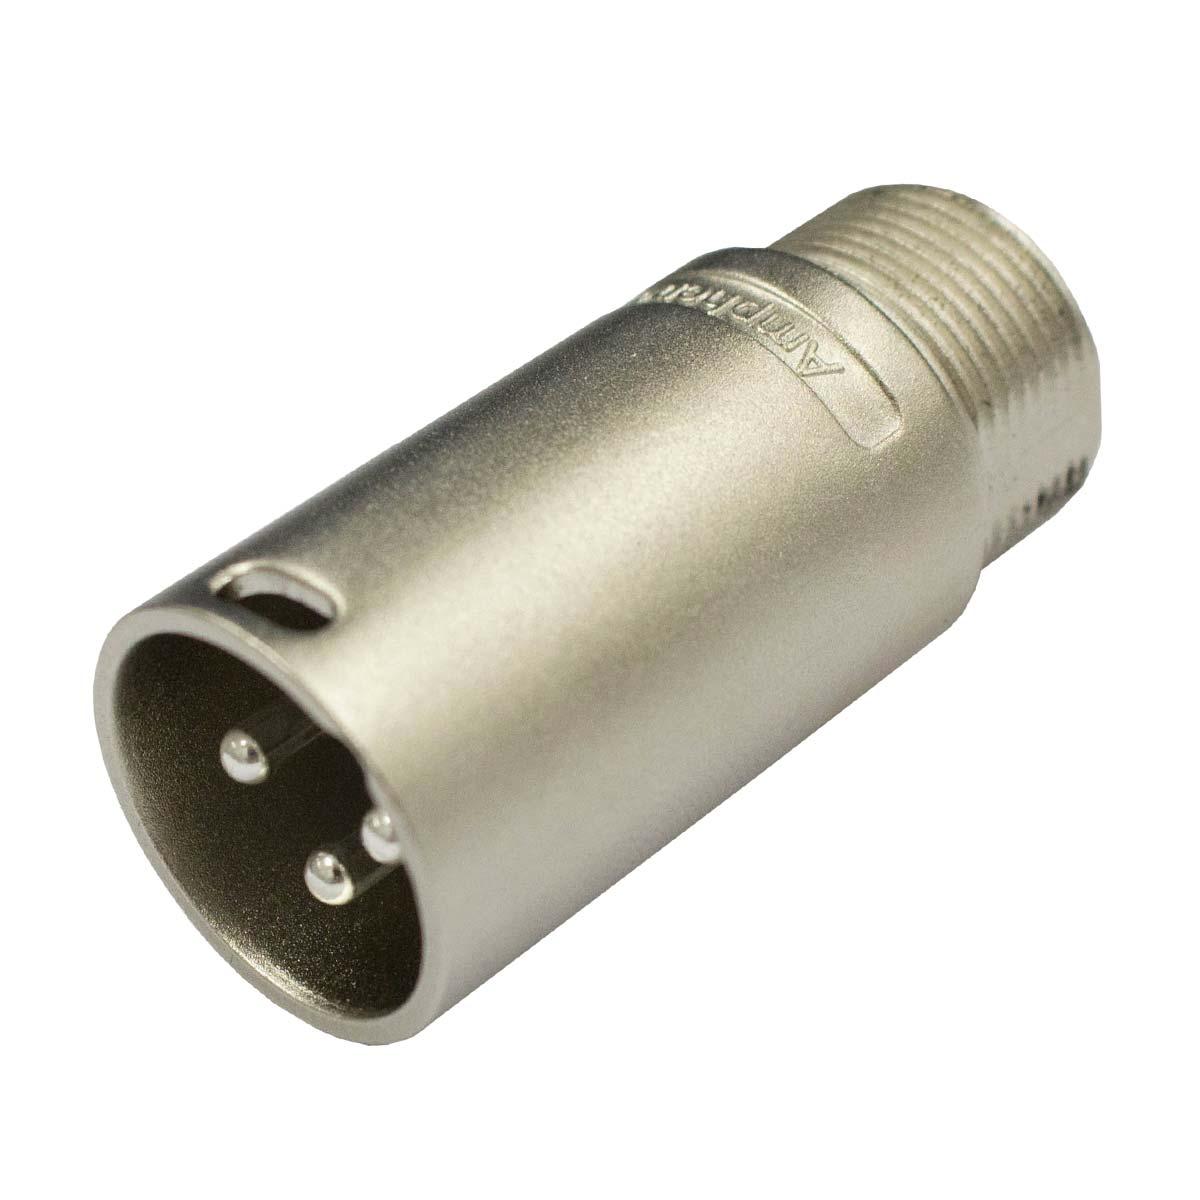 Conector XLR Macho linha - AC 3 MM Amphenol